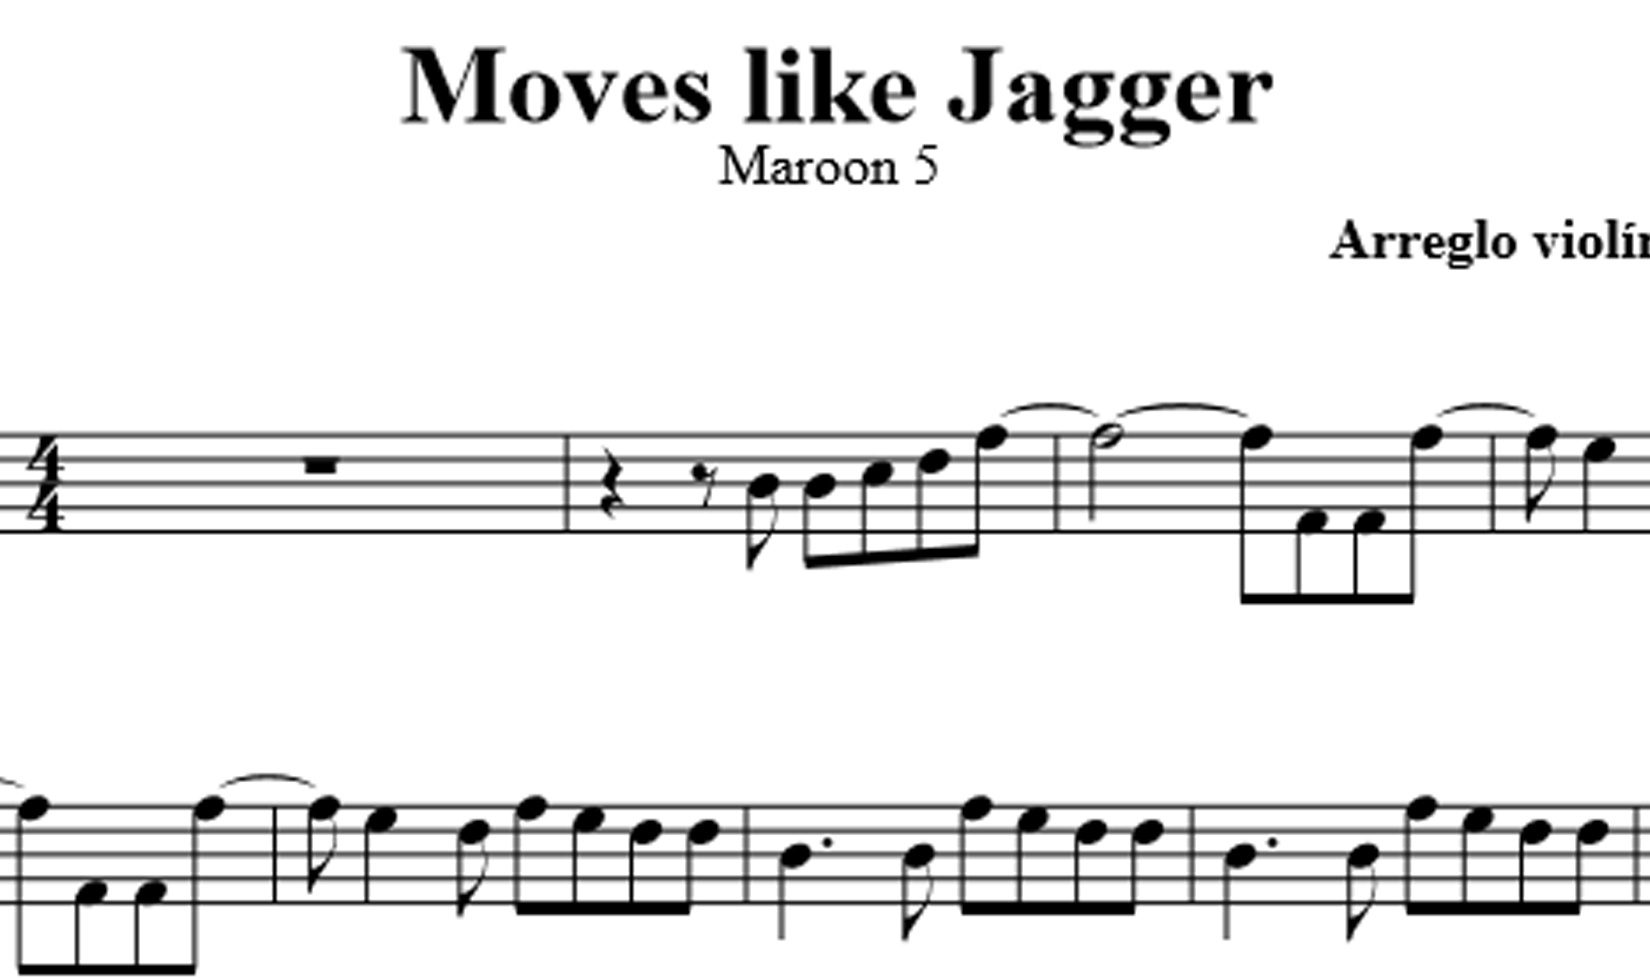 Moves like Jagger - Maroon 5